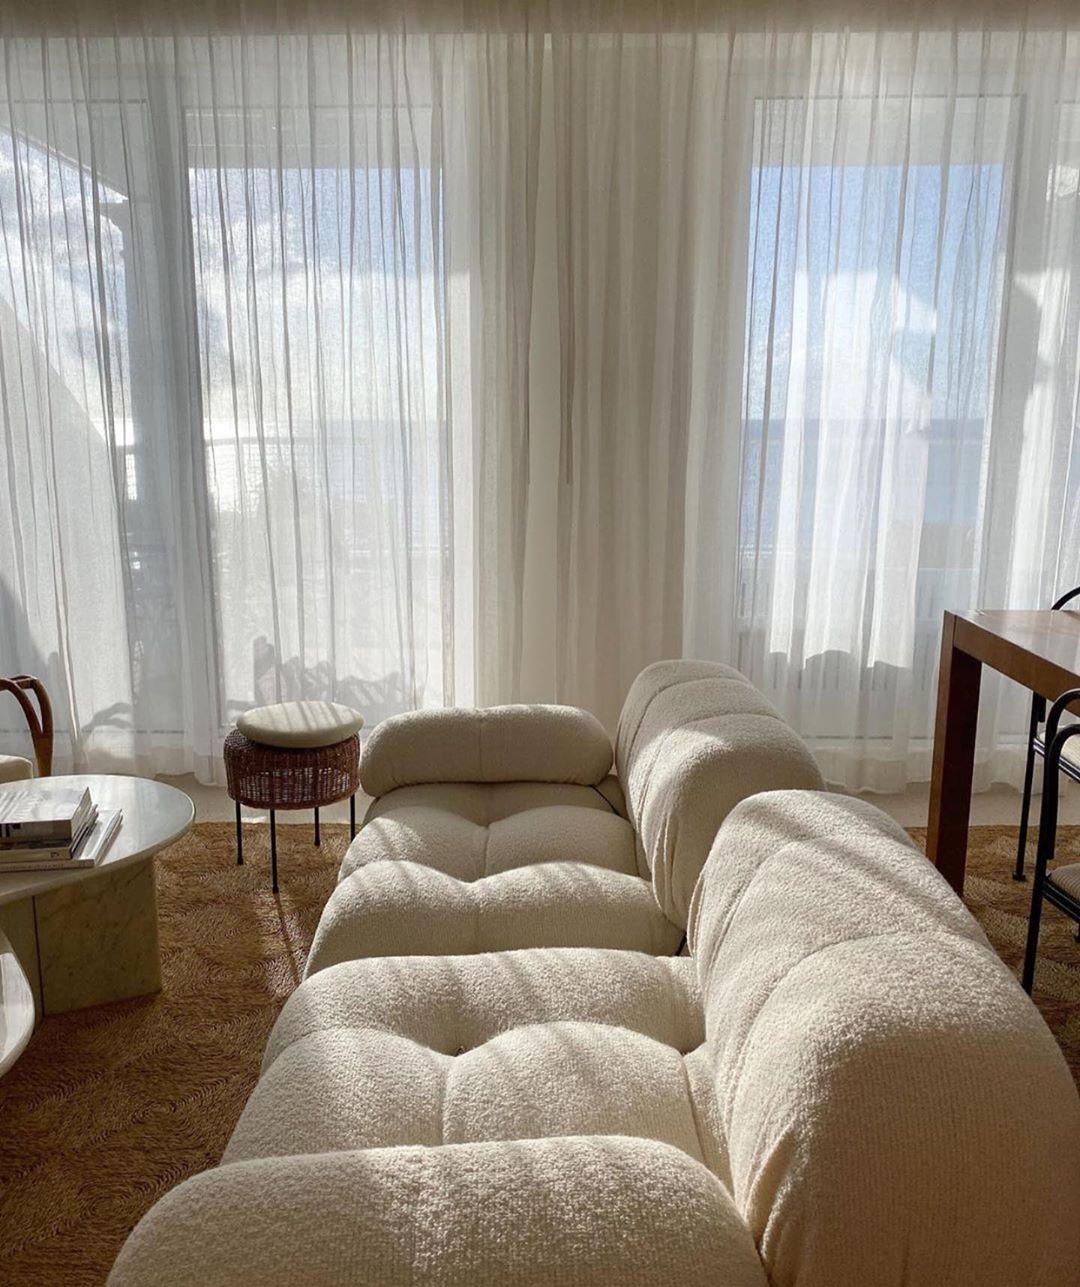 Thenorthwestarch Interiors In 2020 Home Interior Design Home Interior Design #no #foyer #small #living #room